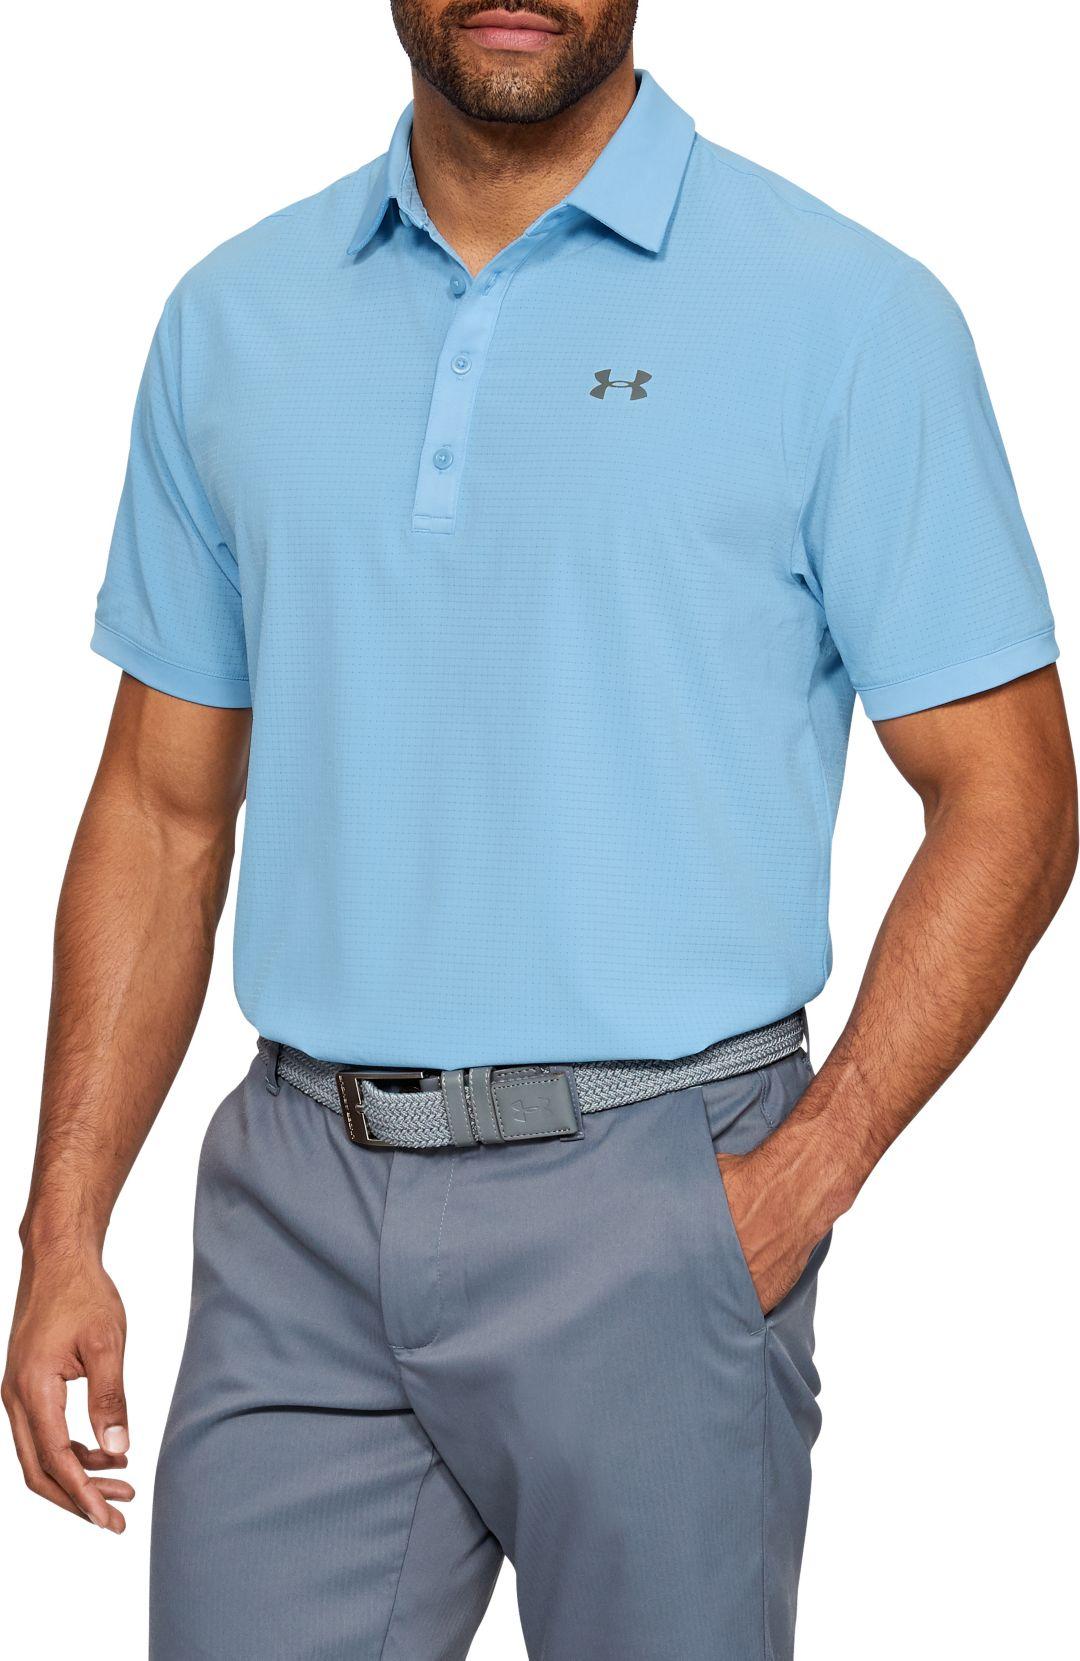 5190c985cff Under Armour Men's Playoff Vented Golf Polo. noImageFound. Previous. 1